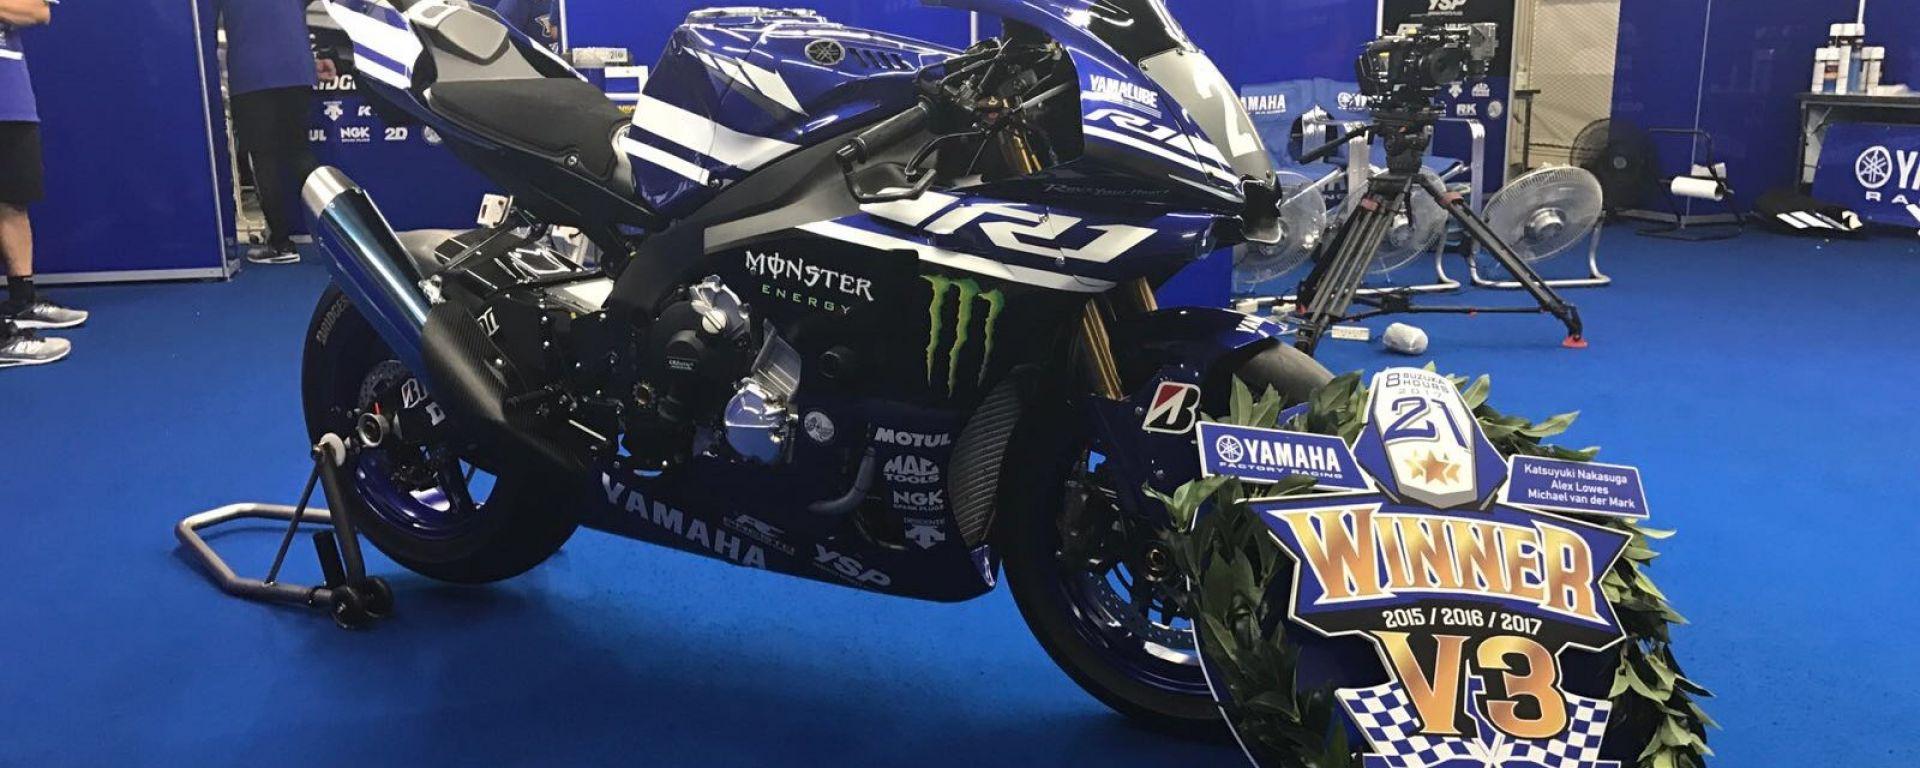 Bridgestone e Yamaha Factory Racing, Campioni alla 8 Ore di Suzuka